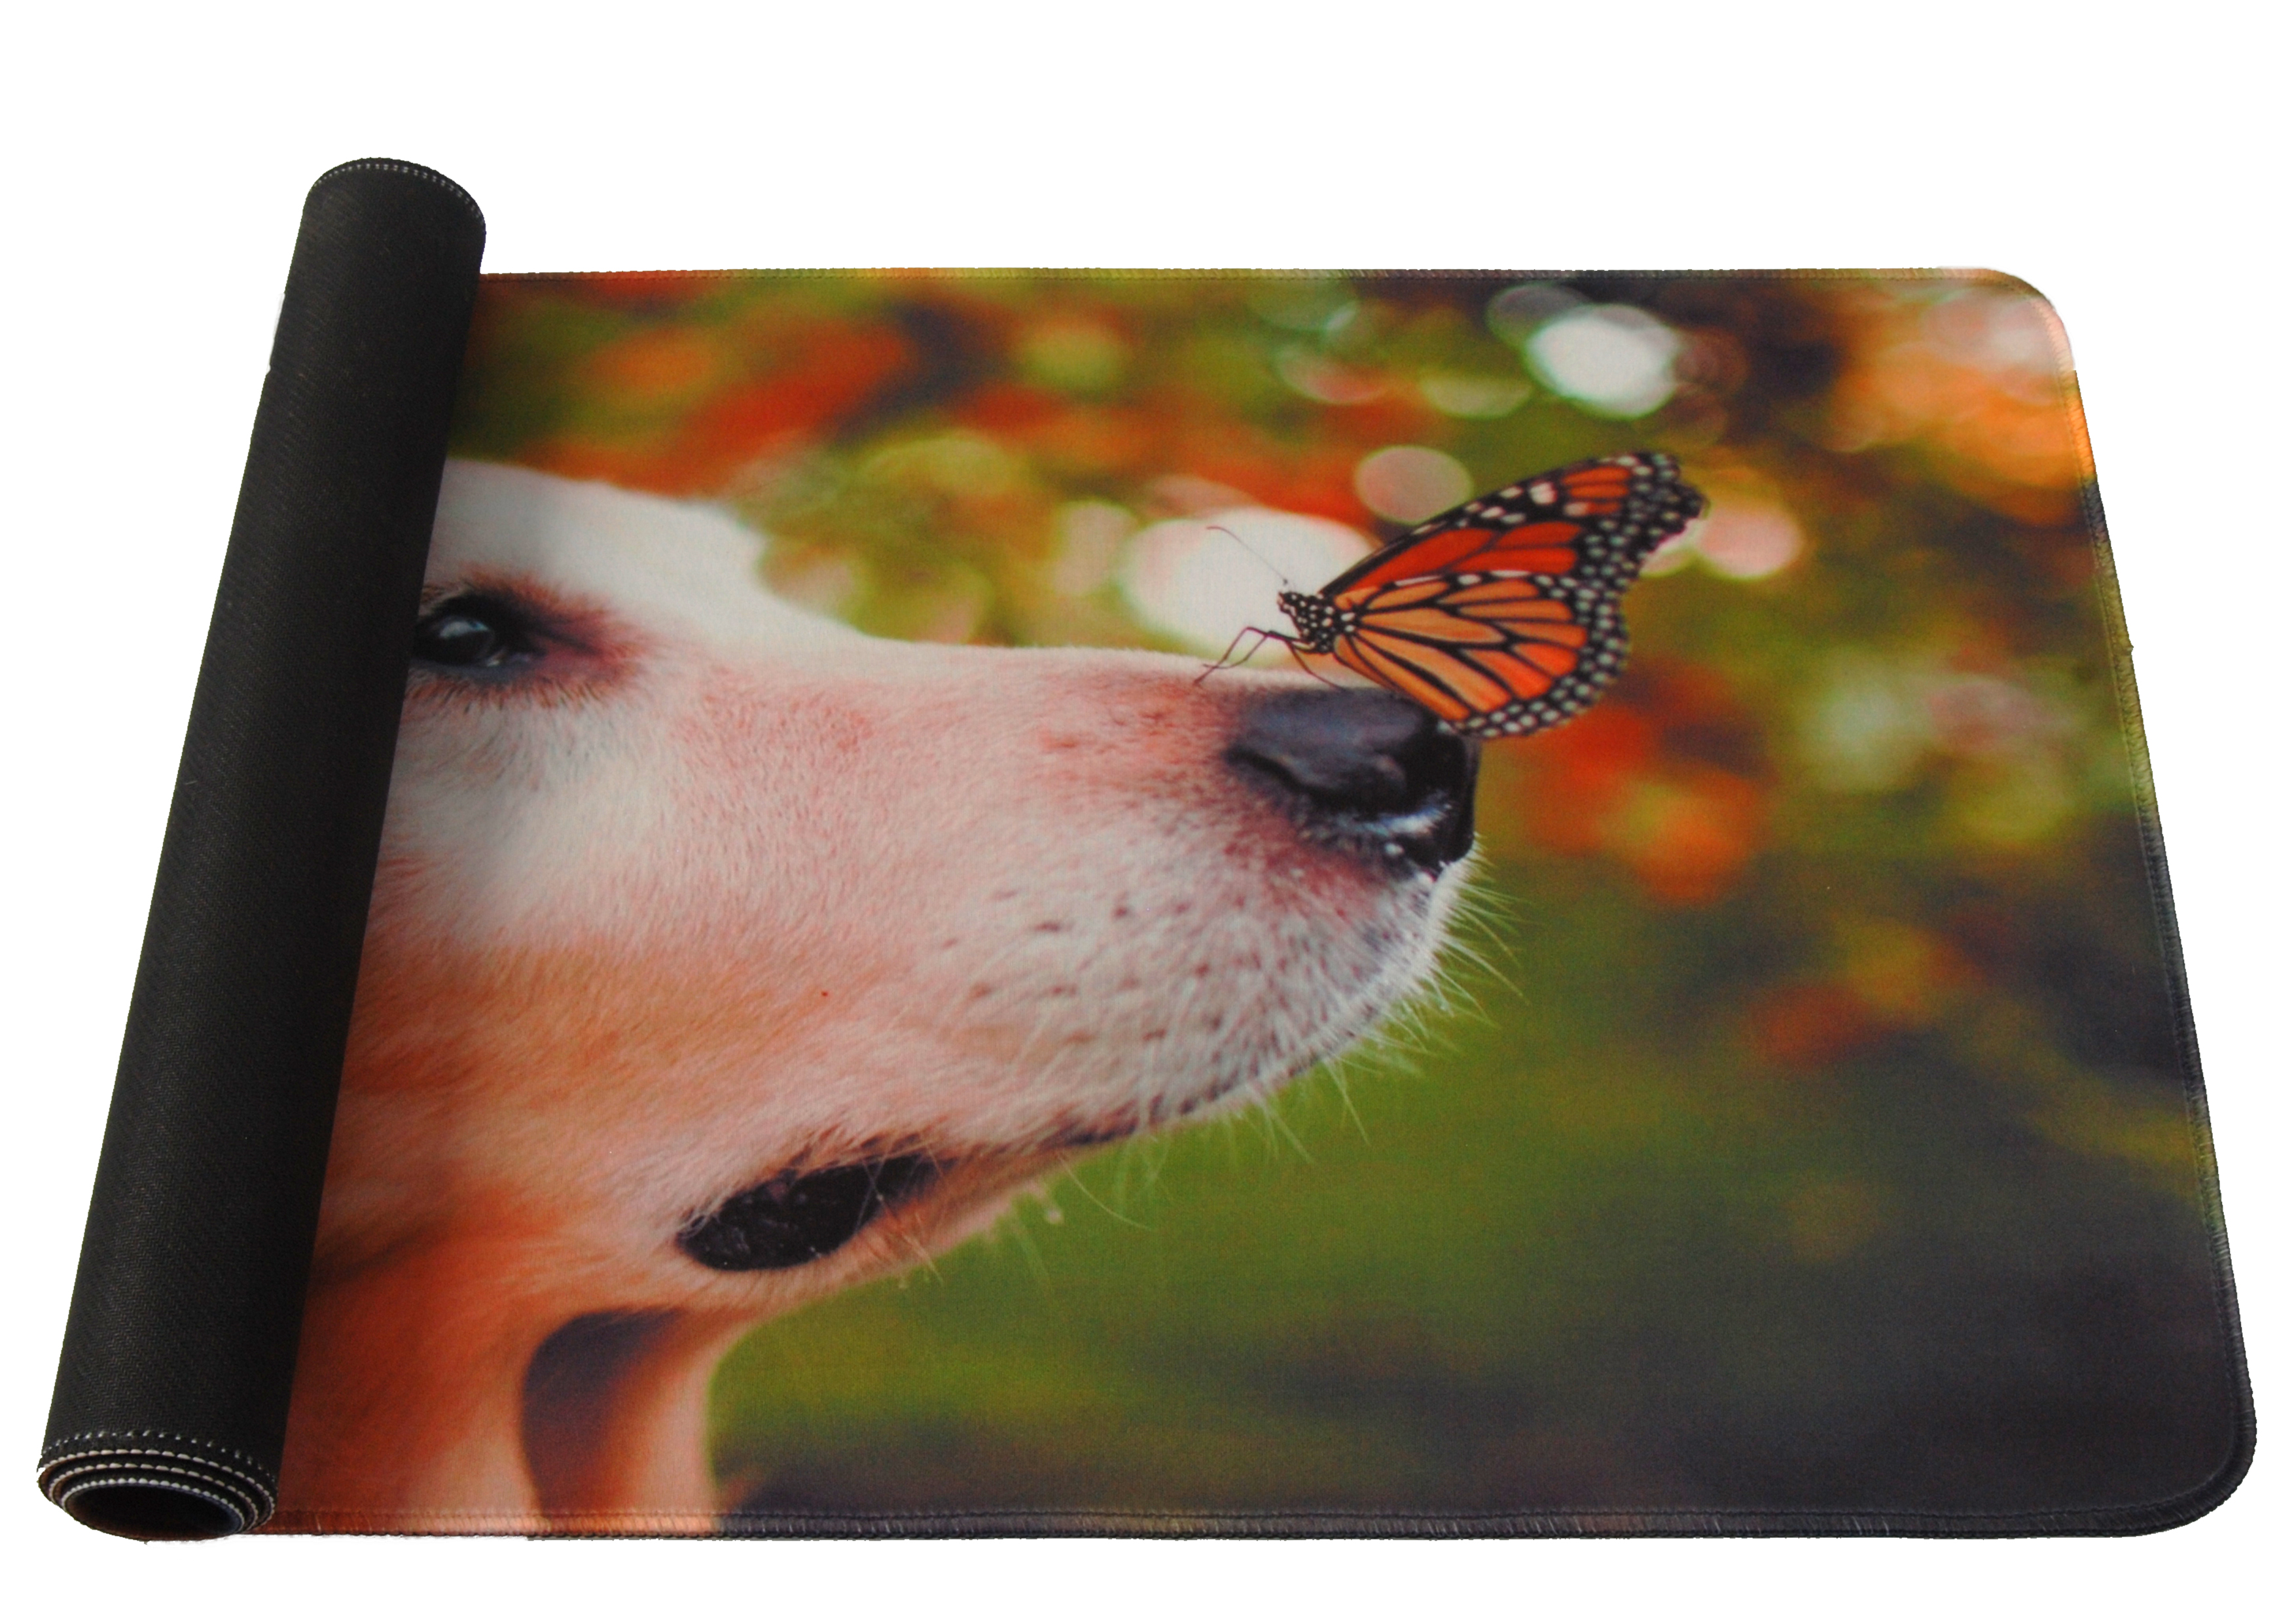 Mousepad, XXL, gaming si birou, 900 x 400 x 3mm, textil cu baza cauciucata, desen Catel si Fluture